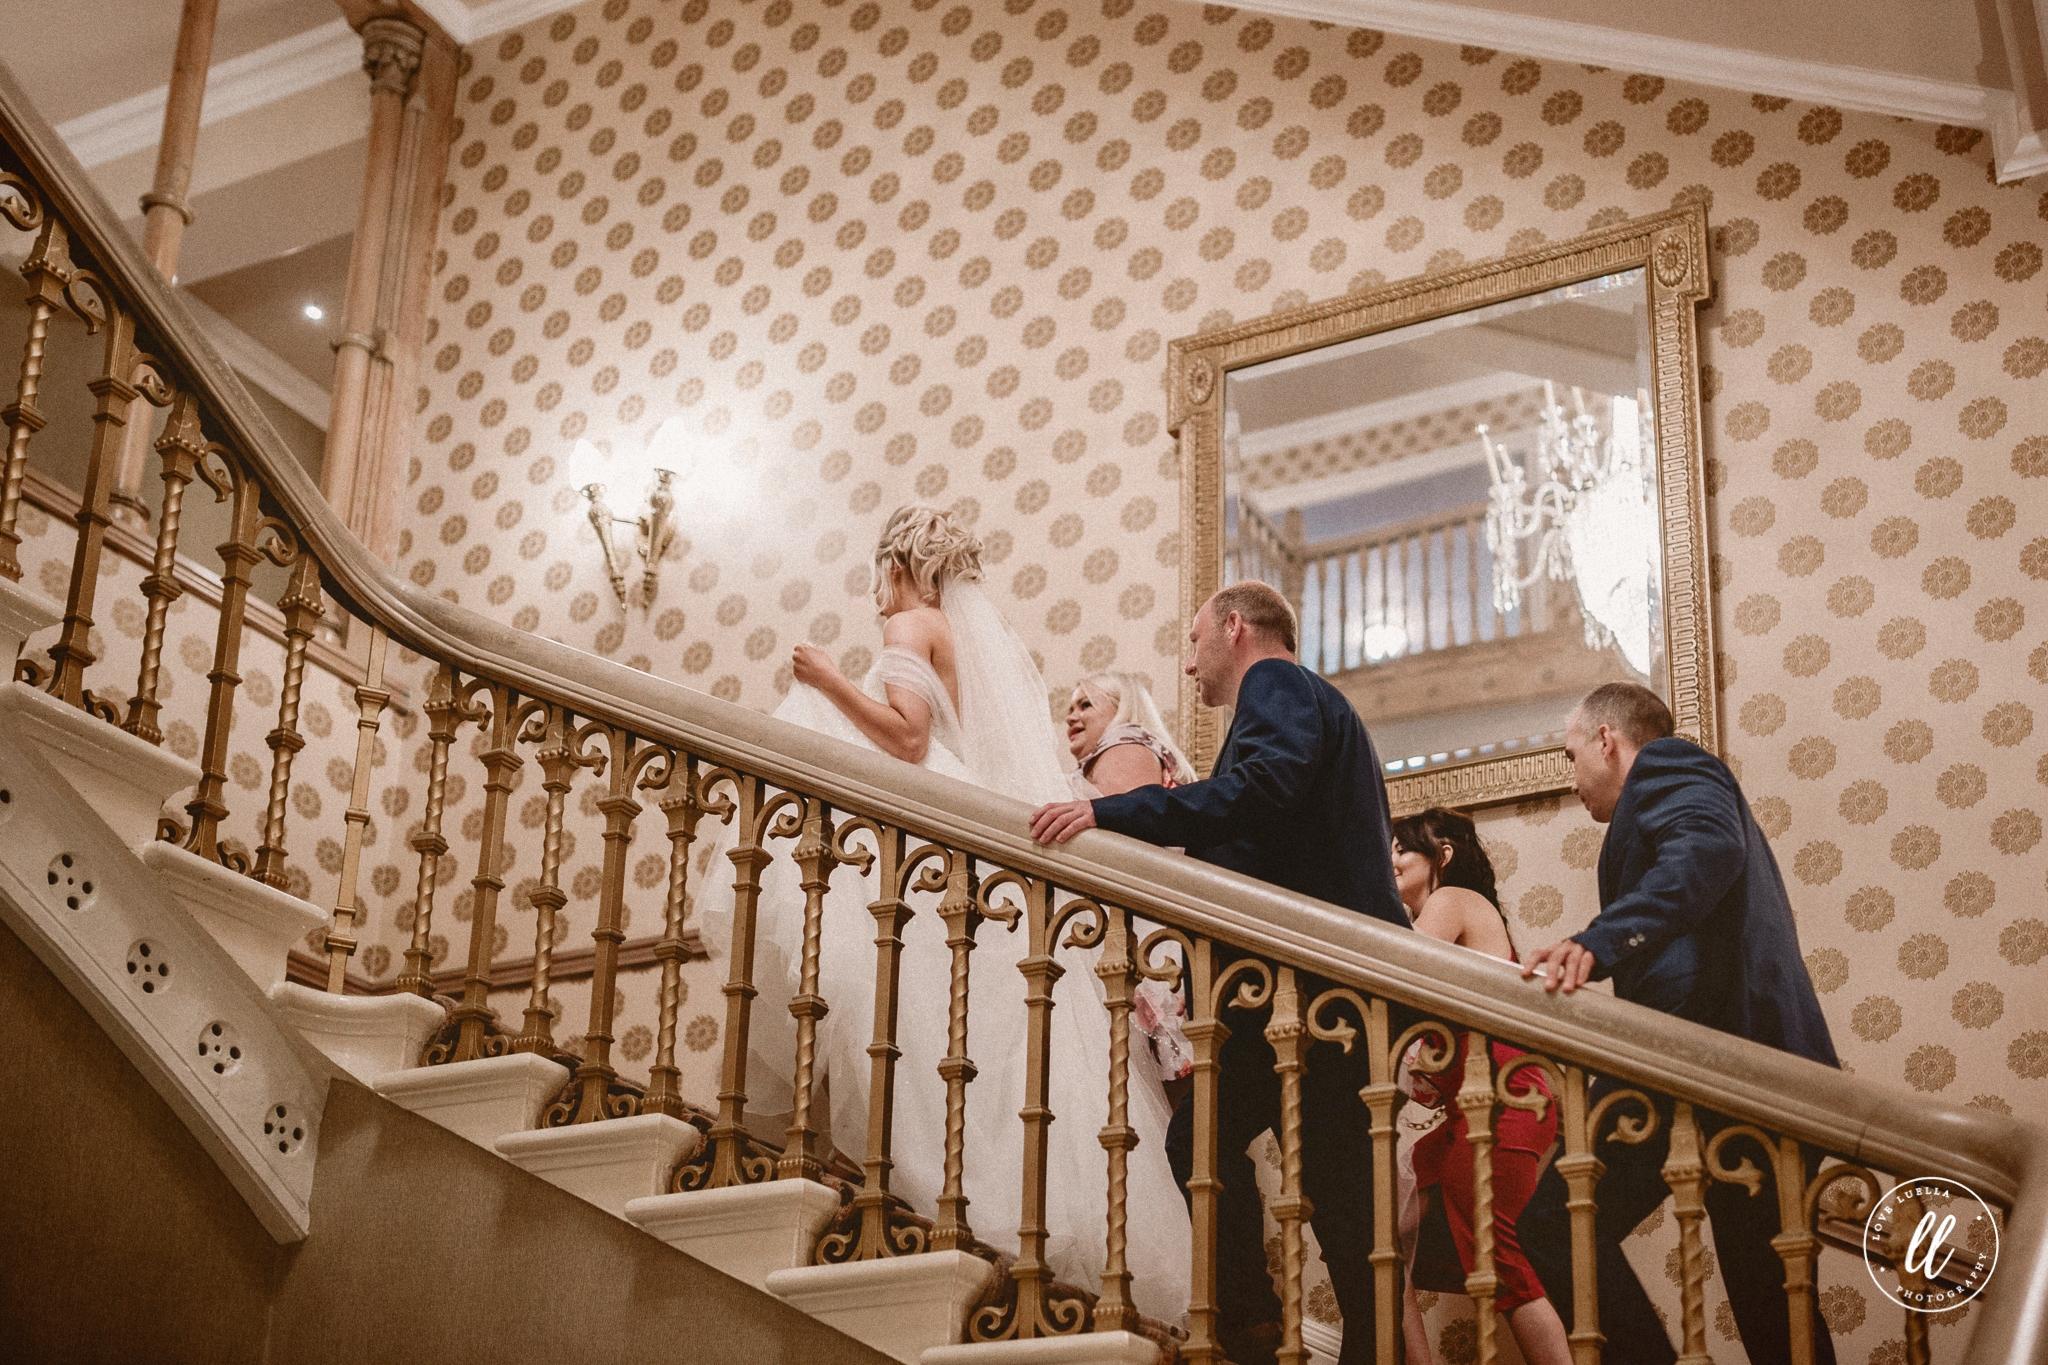 Ascending The Staircase At Chester Grosvenor